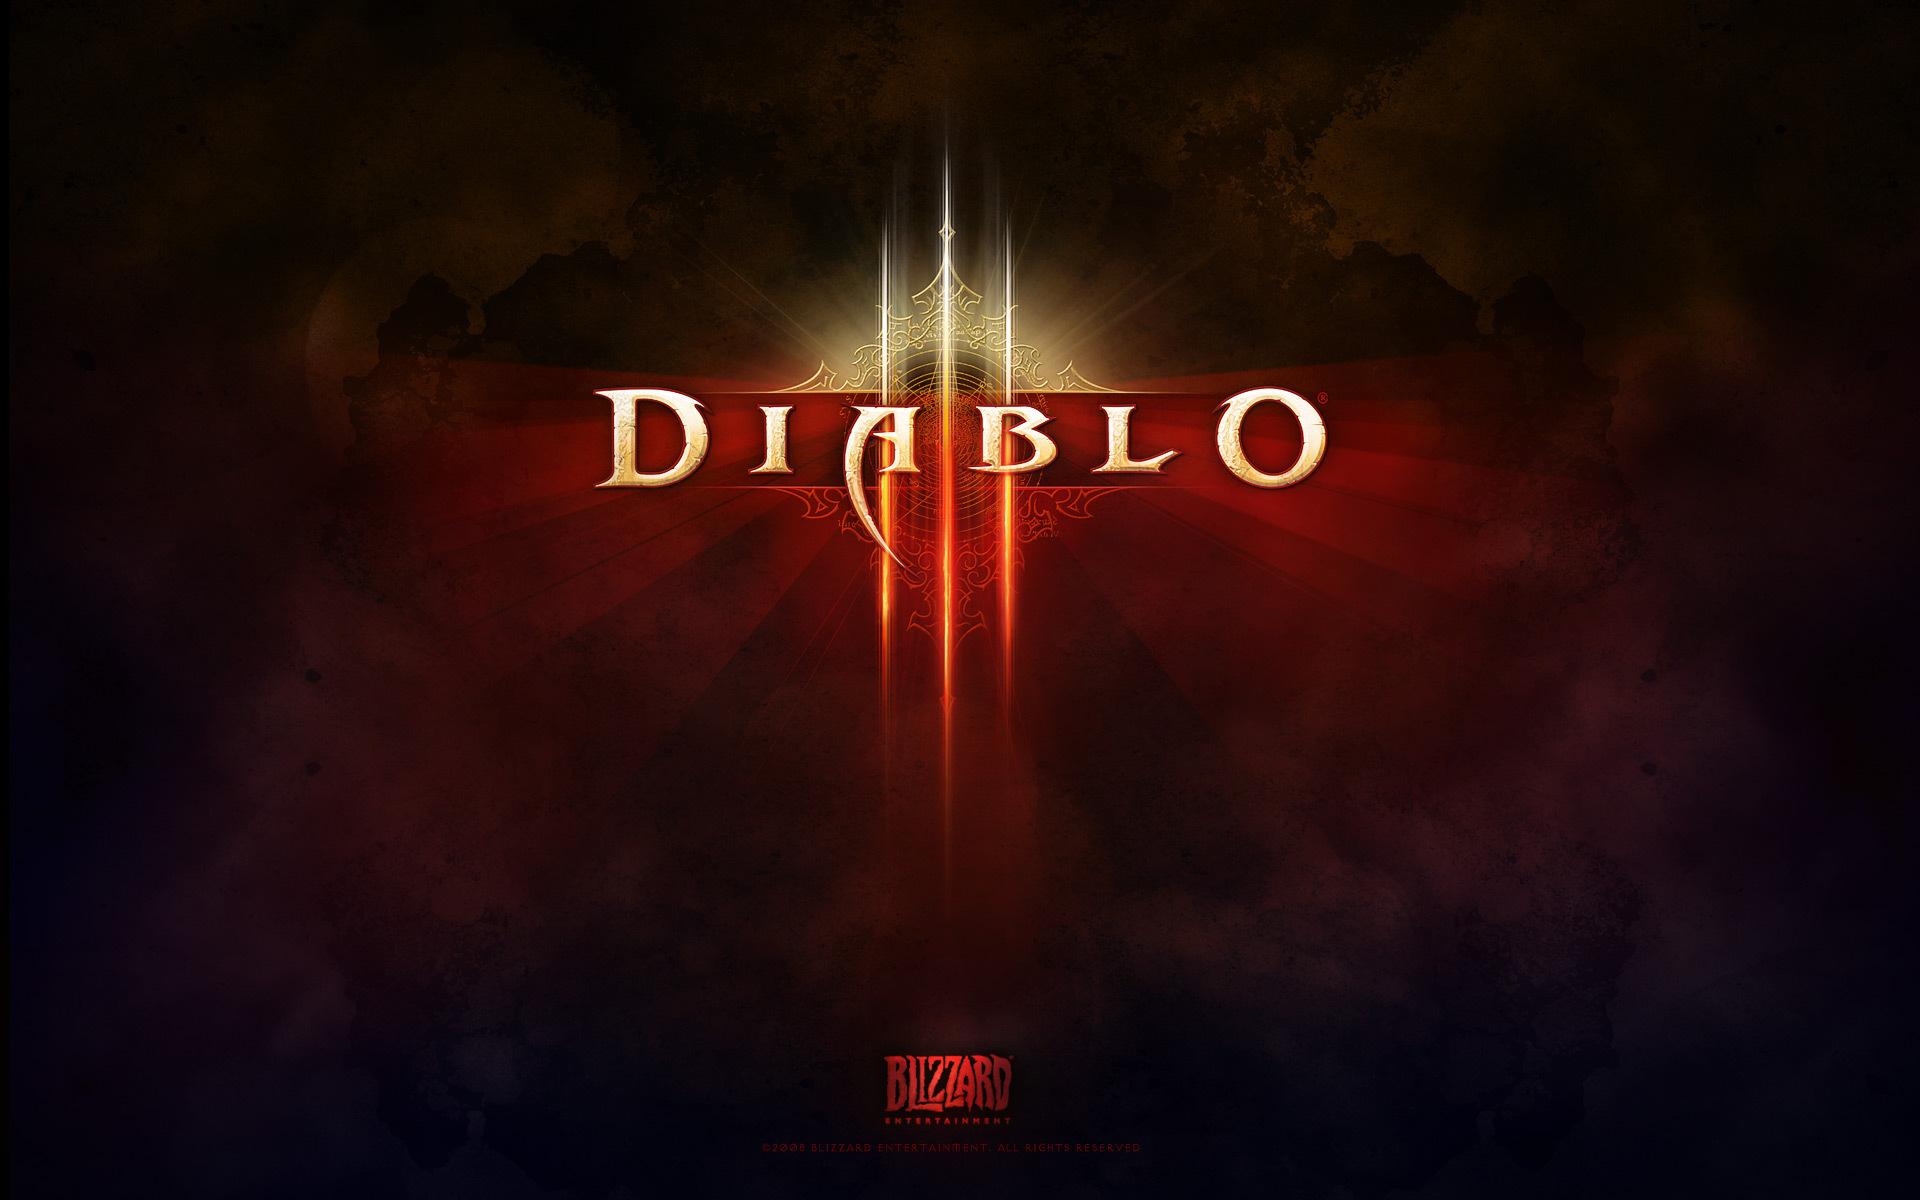 Diablo 3 Wallpapers   Diablo Wallpaper 2347181 1920x1200